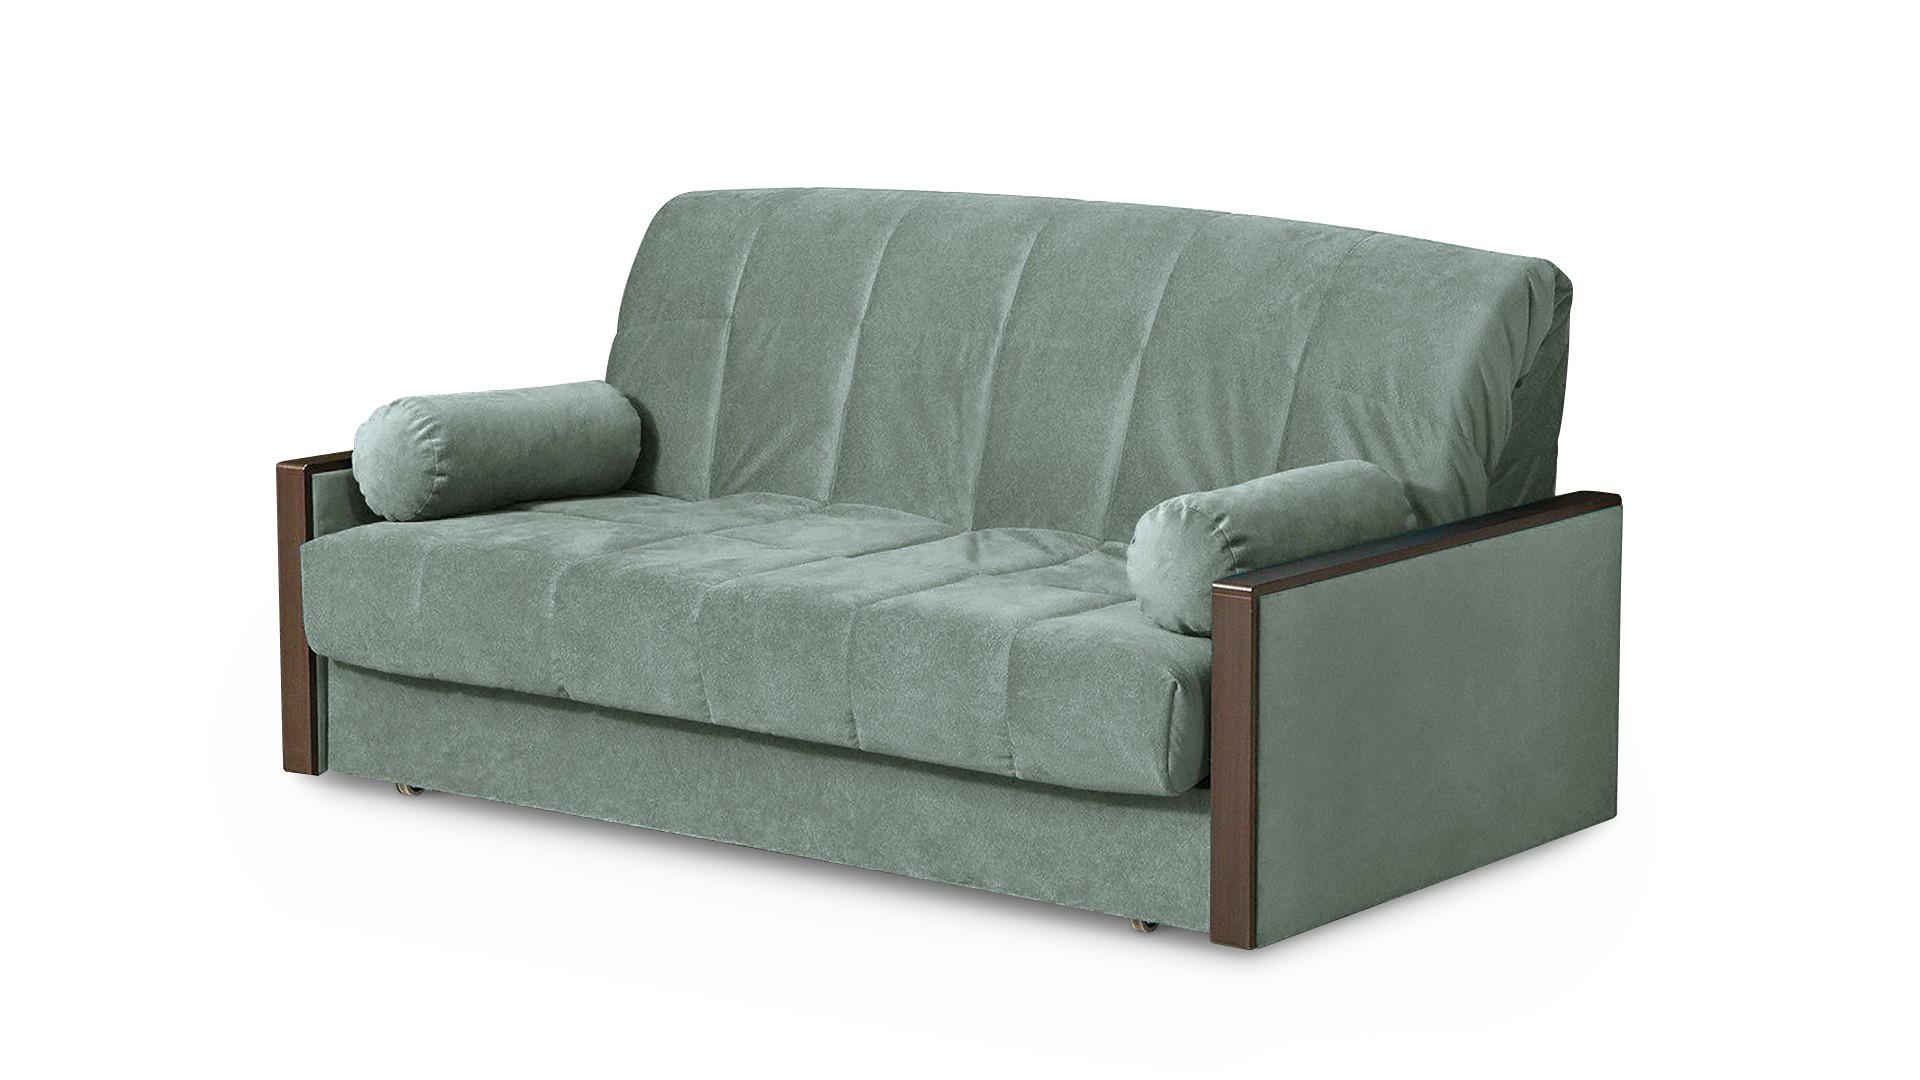 Fiesta диван росанна зеленый 133739/8